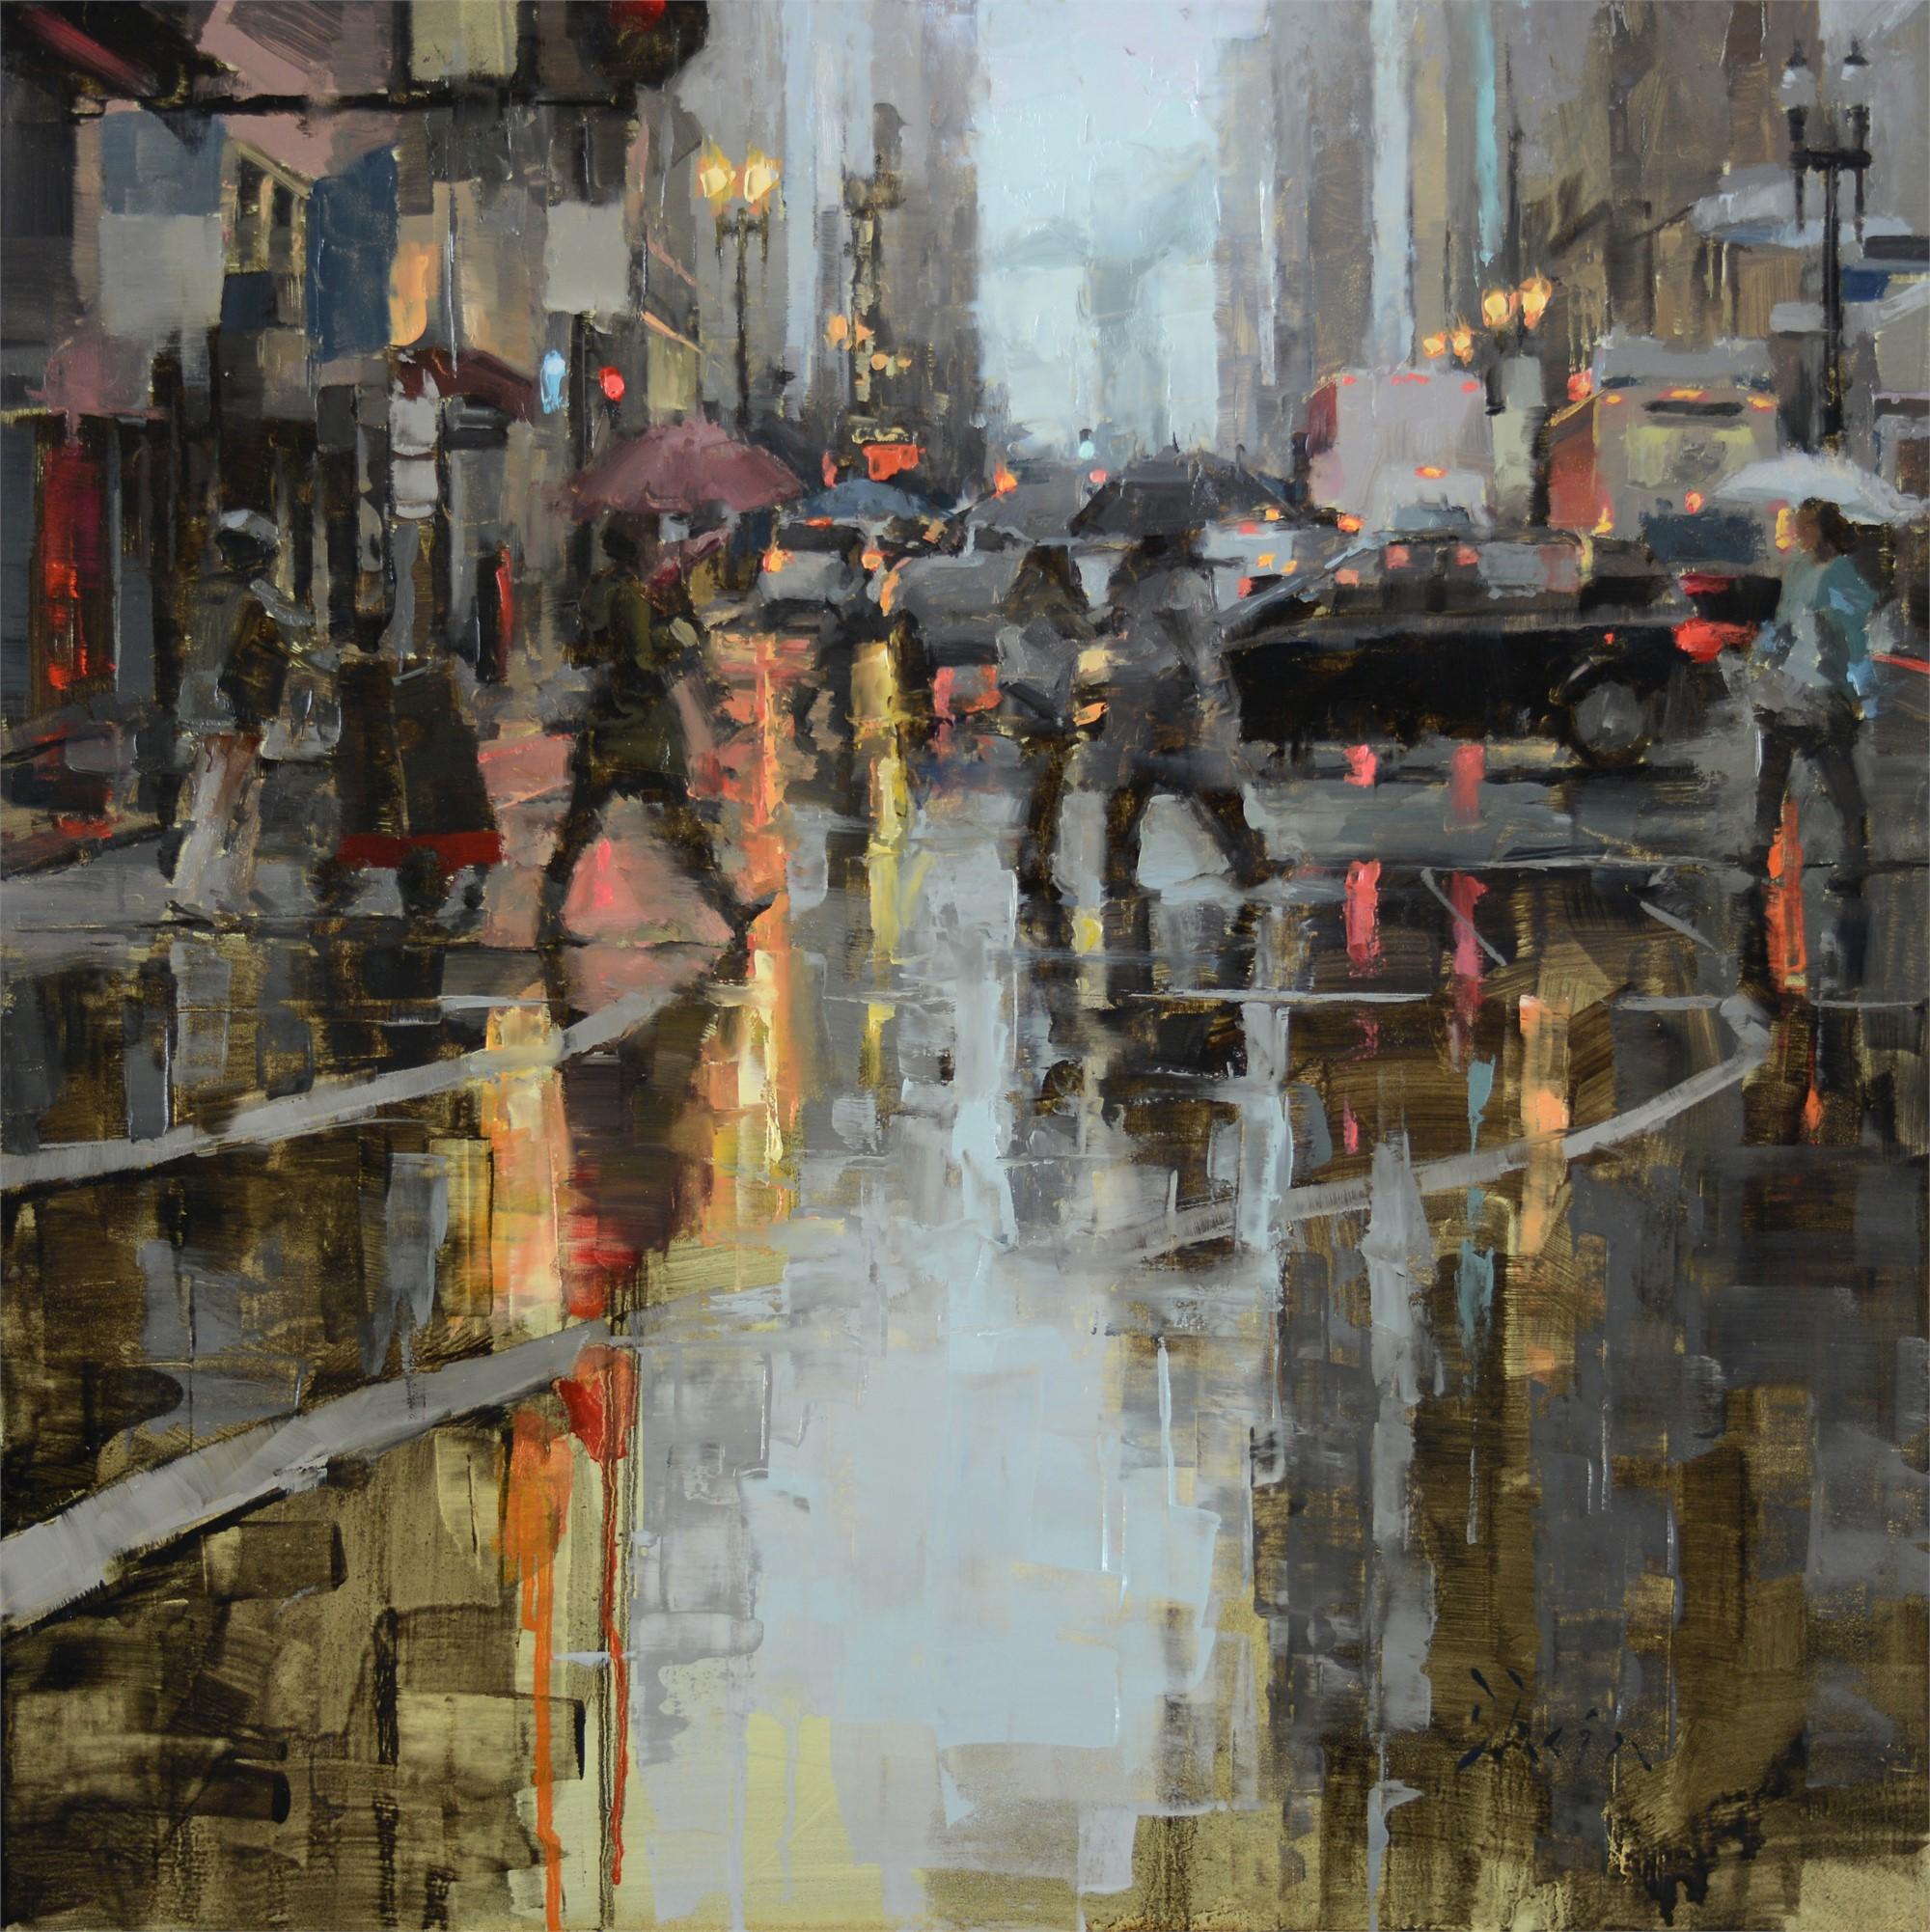 Kearny Street by Jacob Dhein